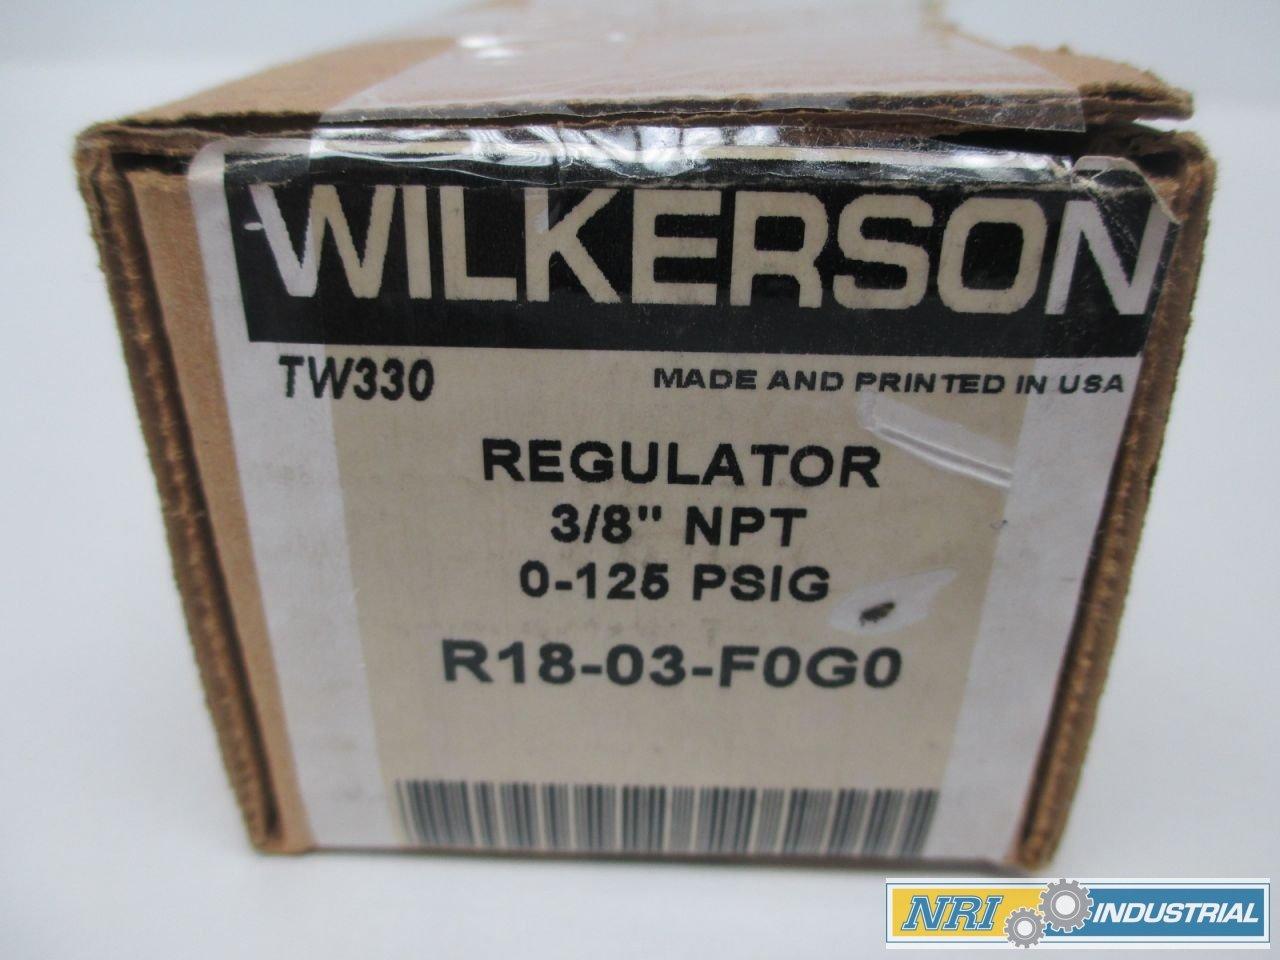 Pre Drilled Bakelite 1.2mm Single Side Copper Prototype PCB Matrix Board 100x150